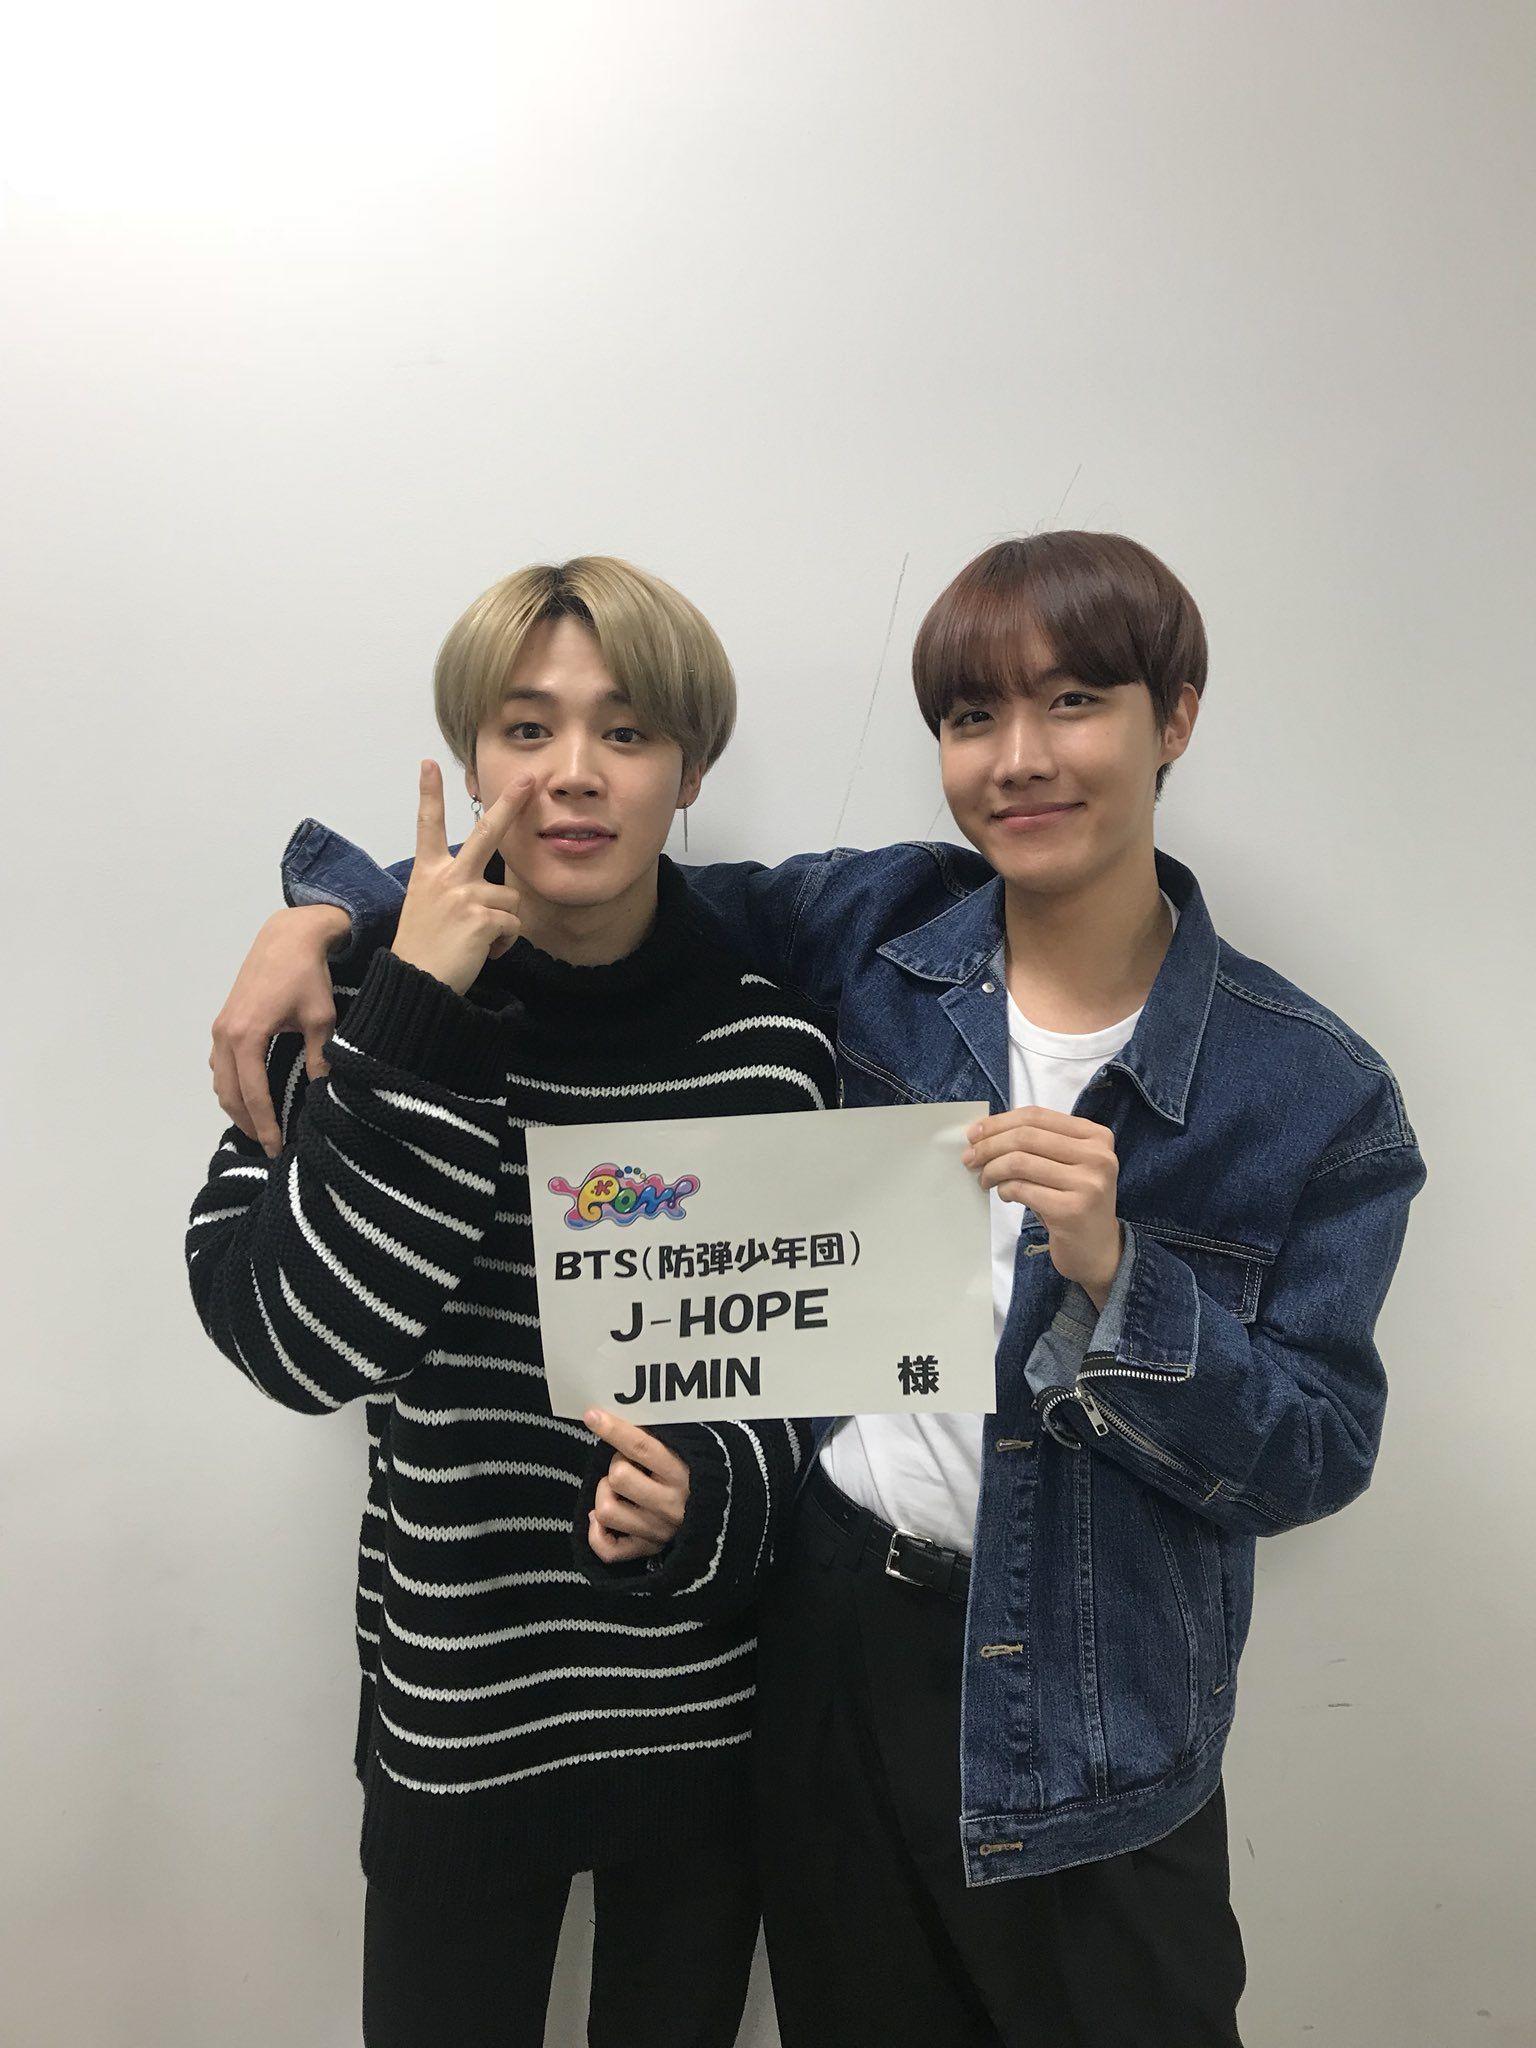 Jimin and J-Hope break down the TRUE personalities of BTS - Koreaboo